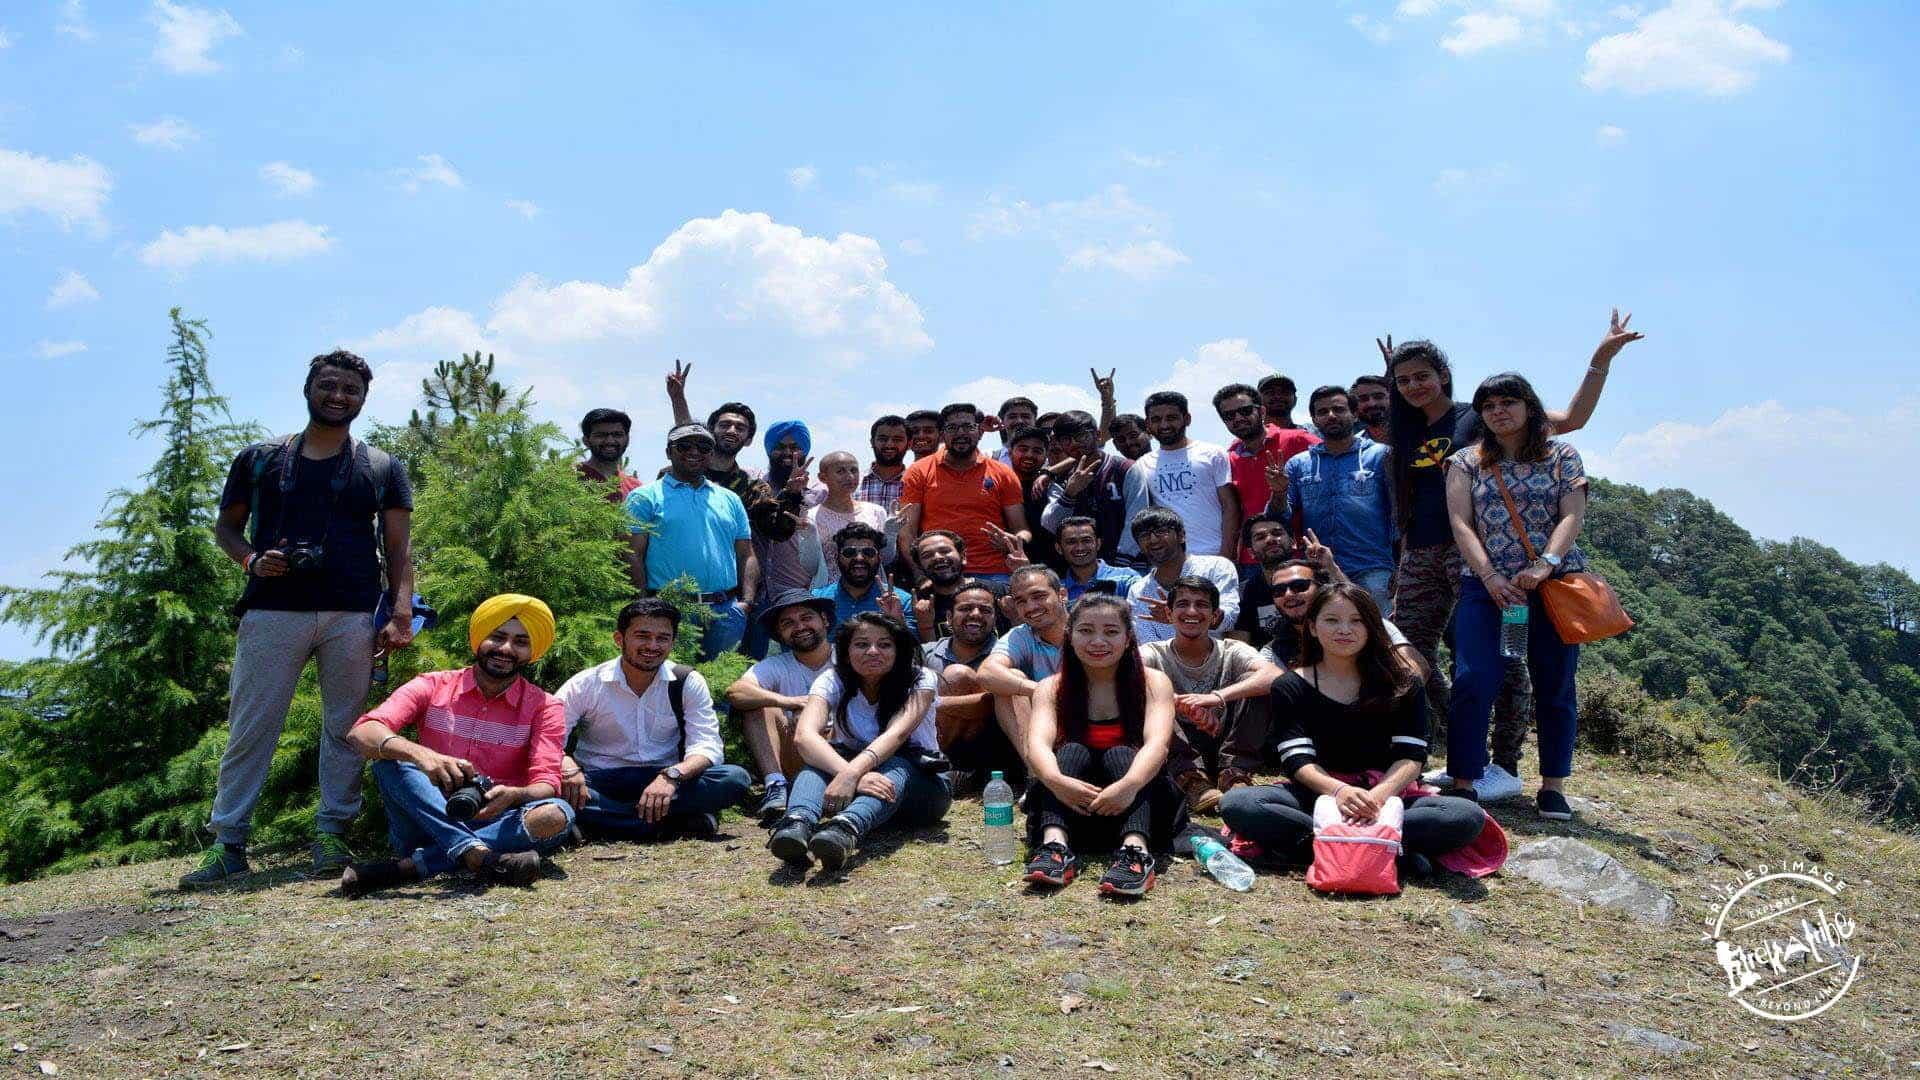 Instameet Shimla - Trekatribe & Instahimachal Collaboration